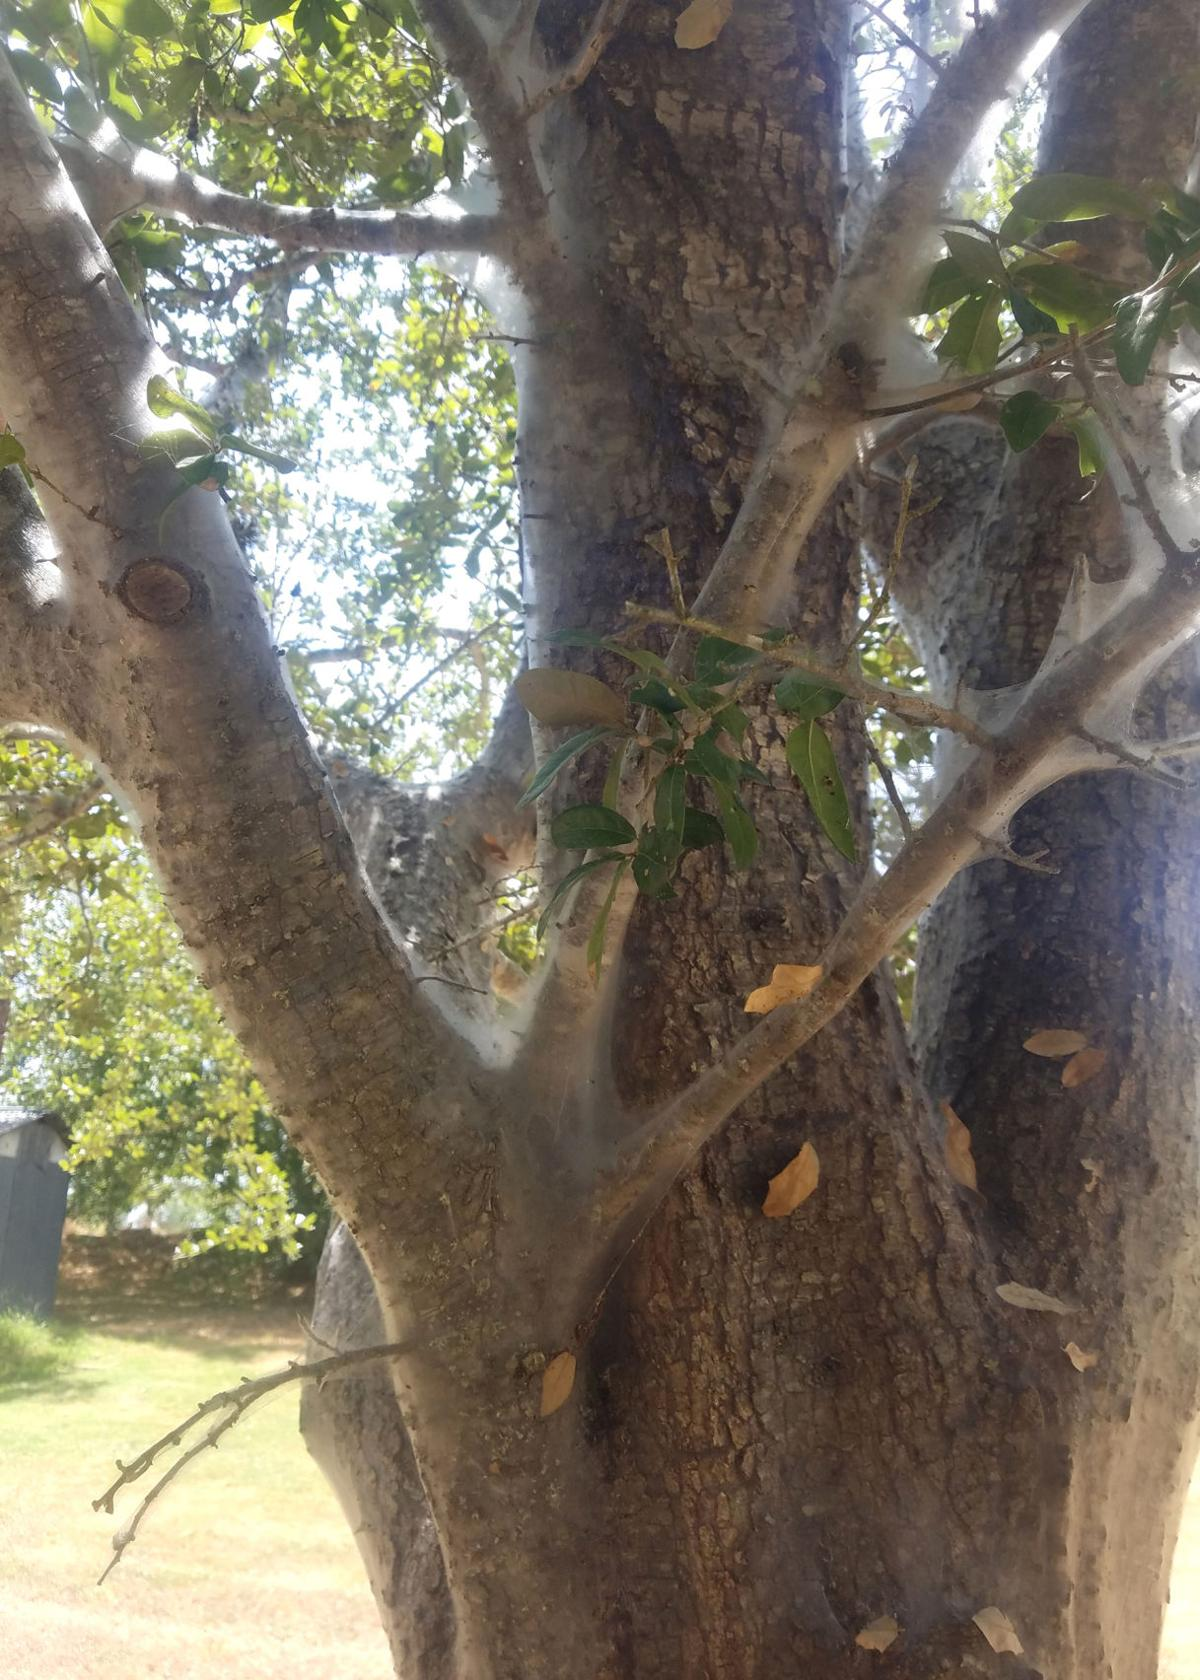 TEXAS GARDENING: Bark lice